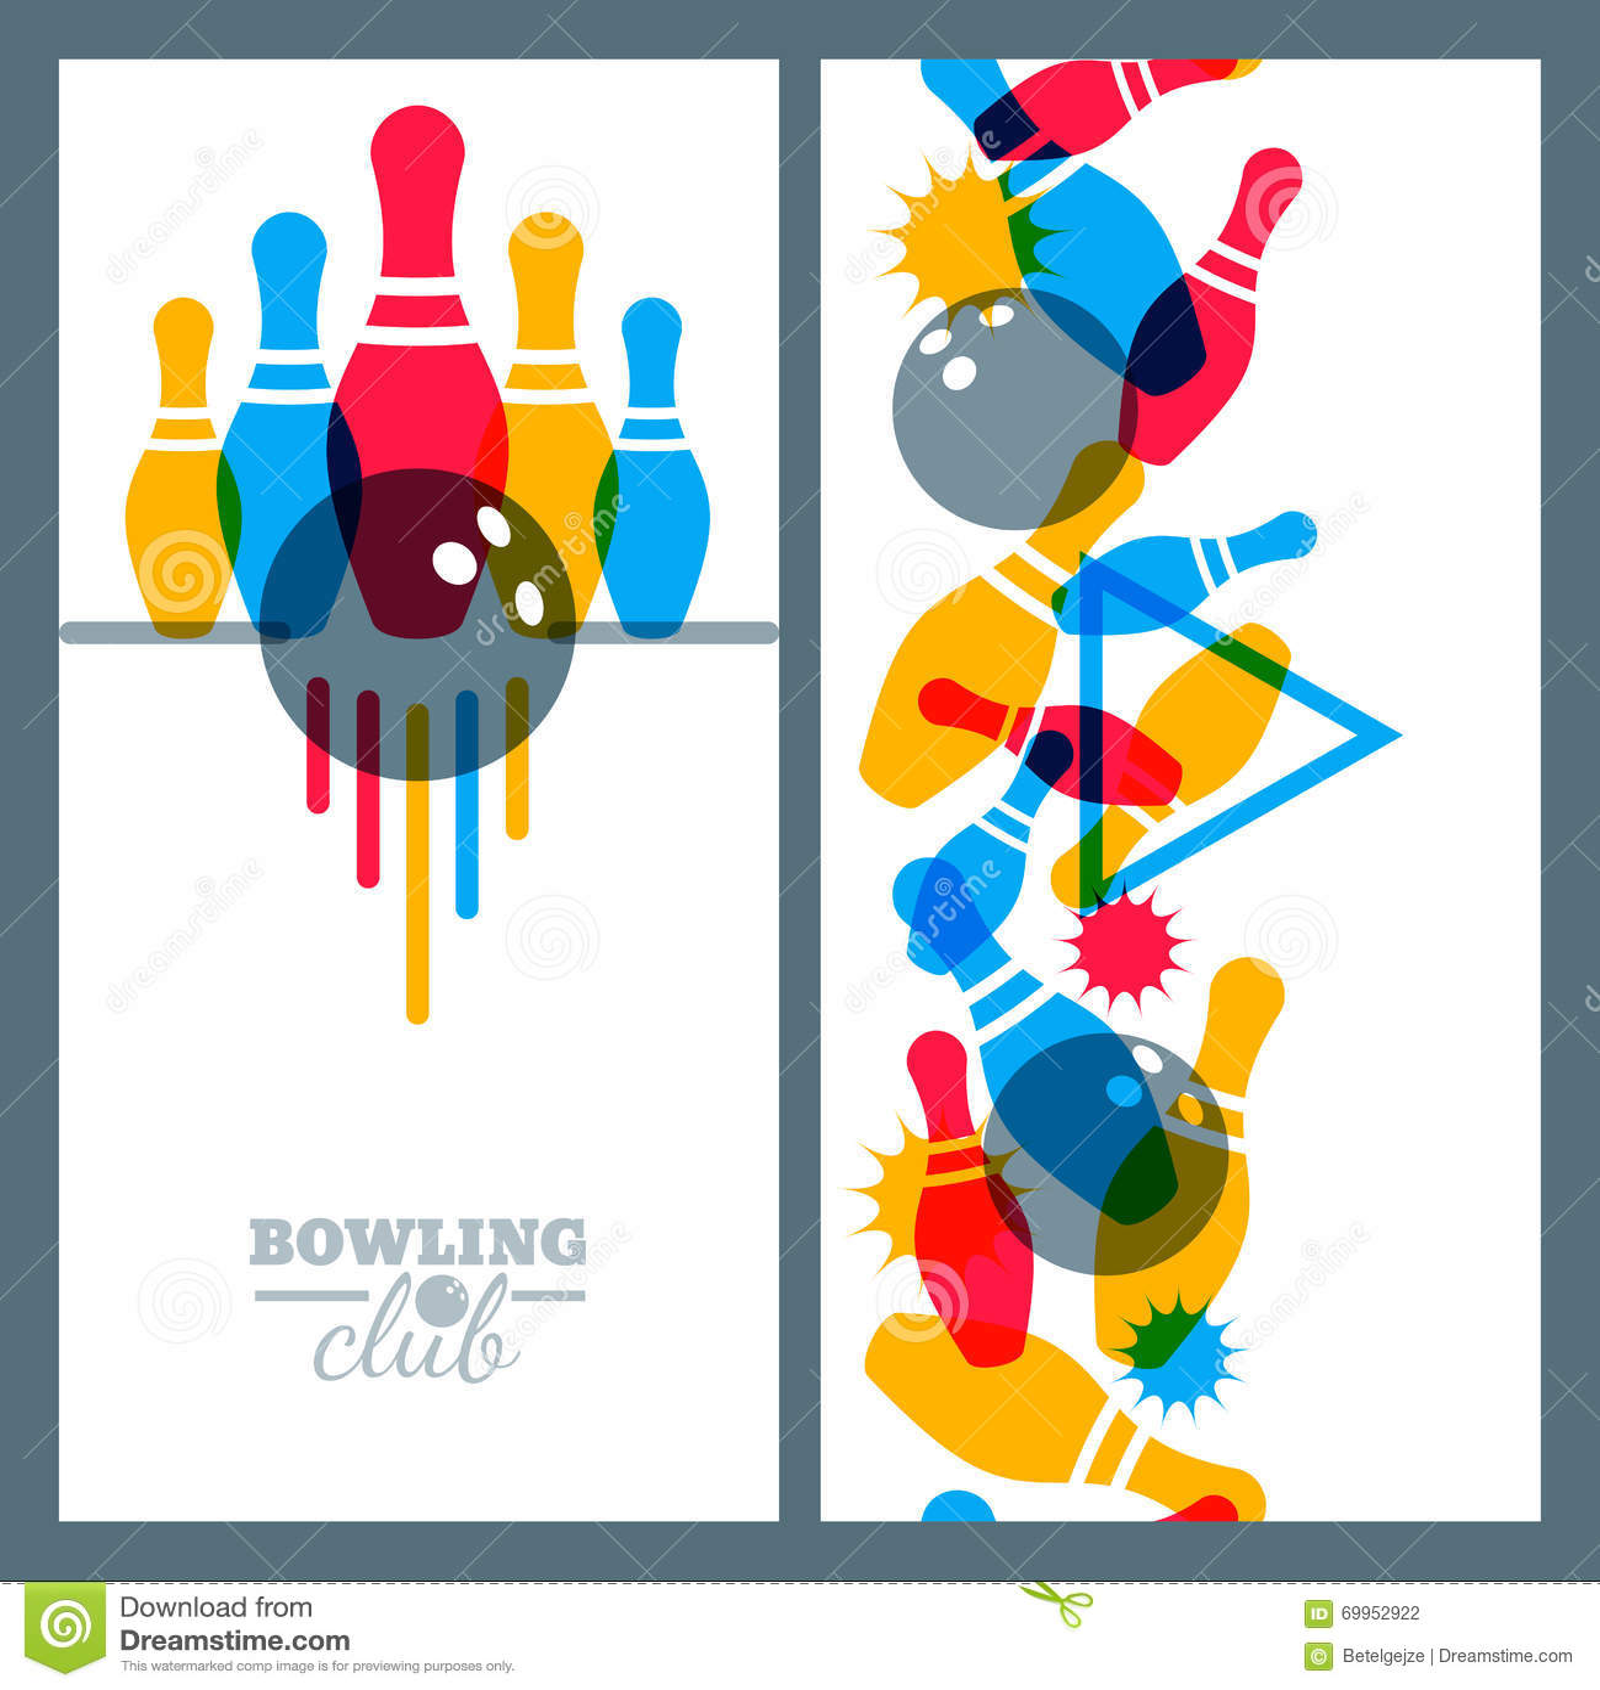 Design elements banner - Background Ball Banner Bowling Design